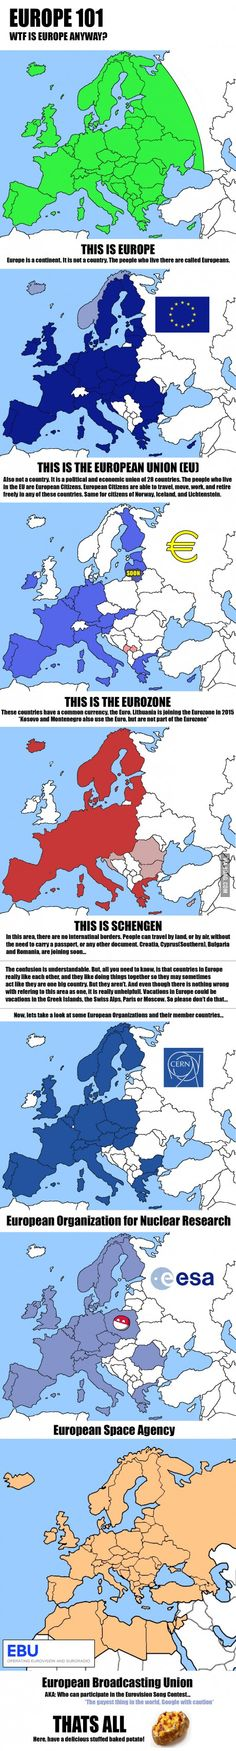 Europe explained for non-Europeans!